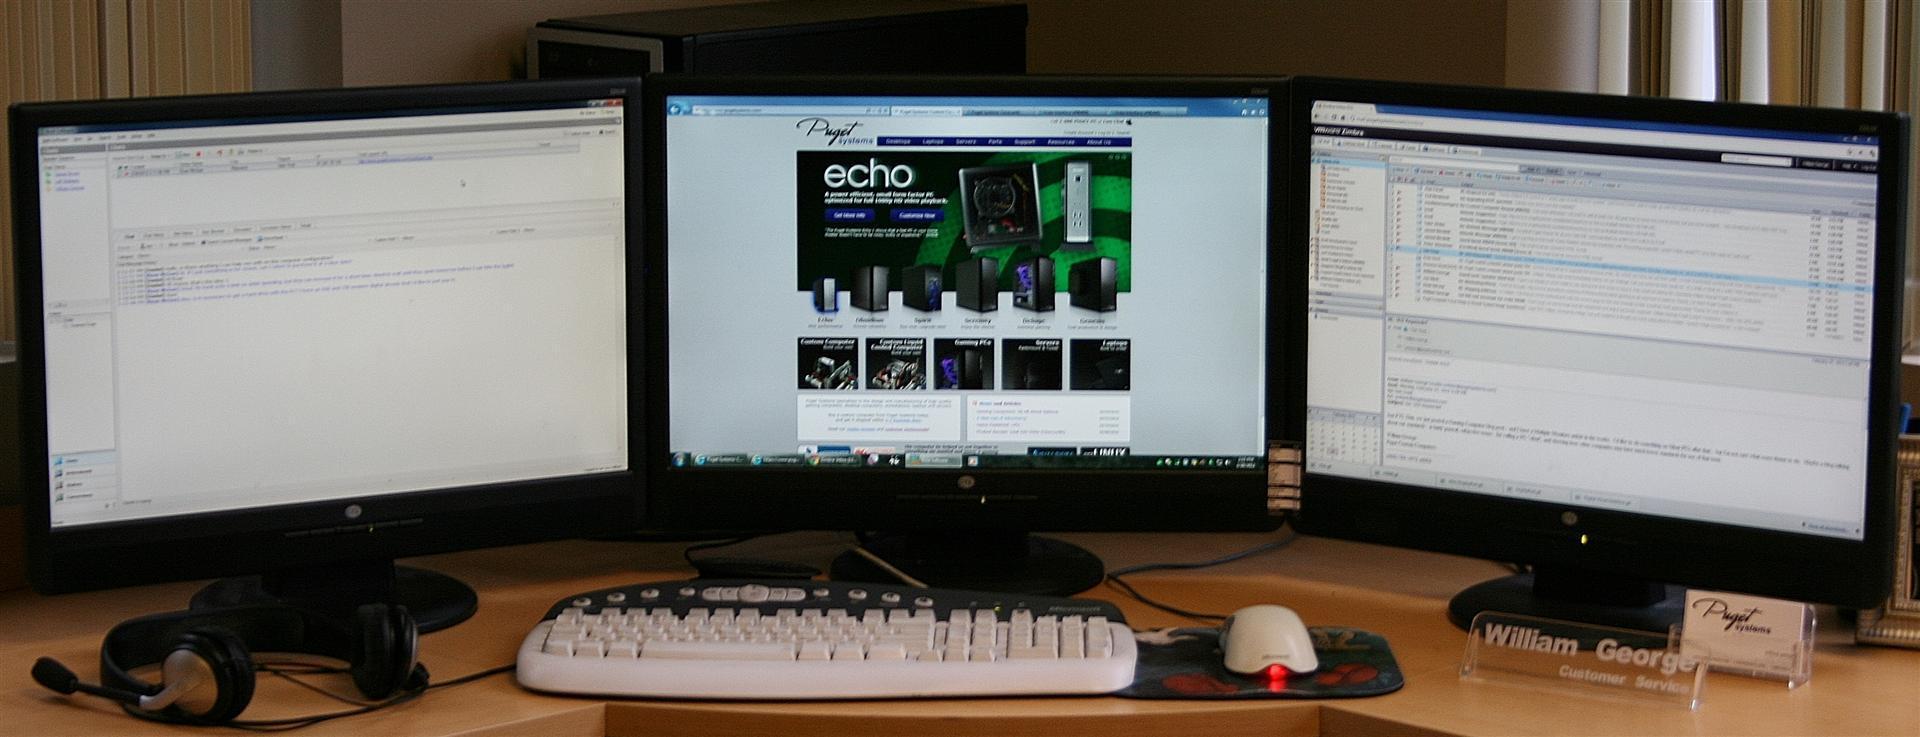 Author's Triple Monitor Desktop